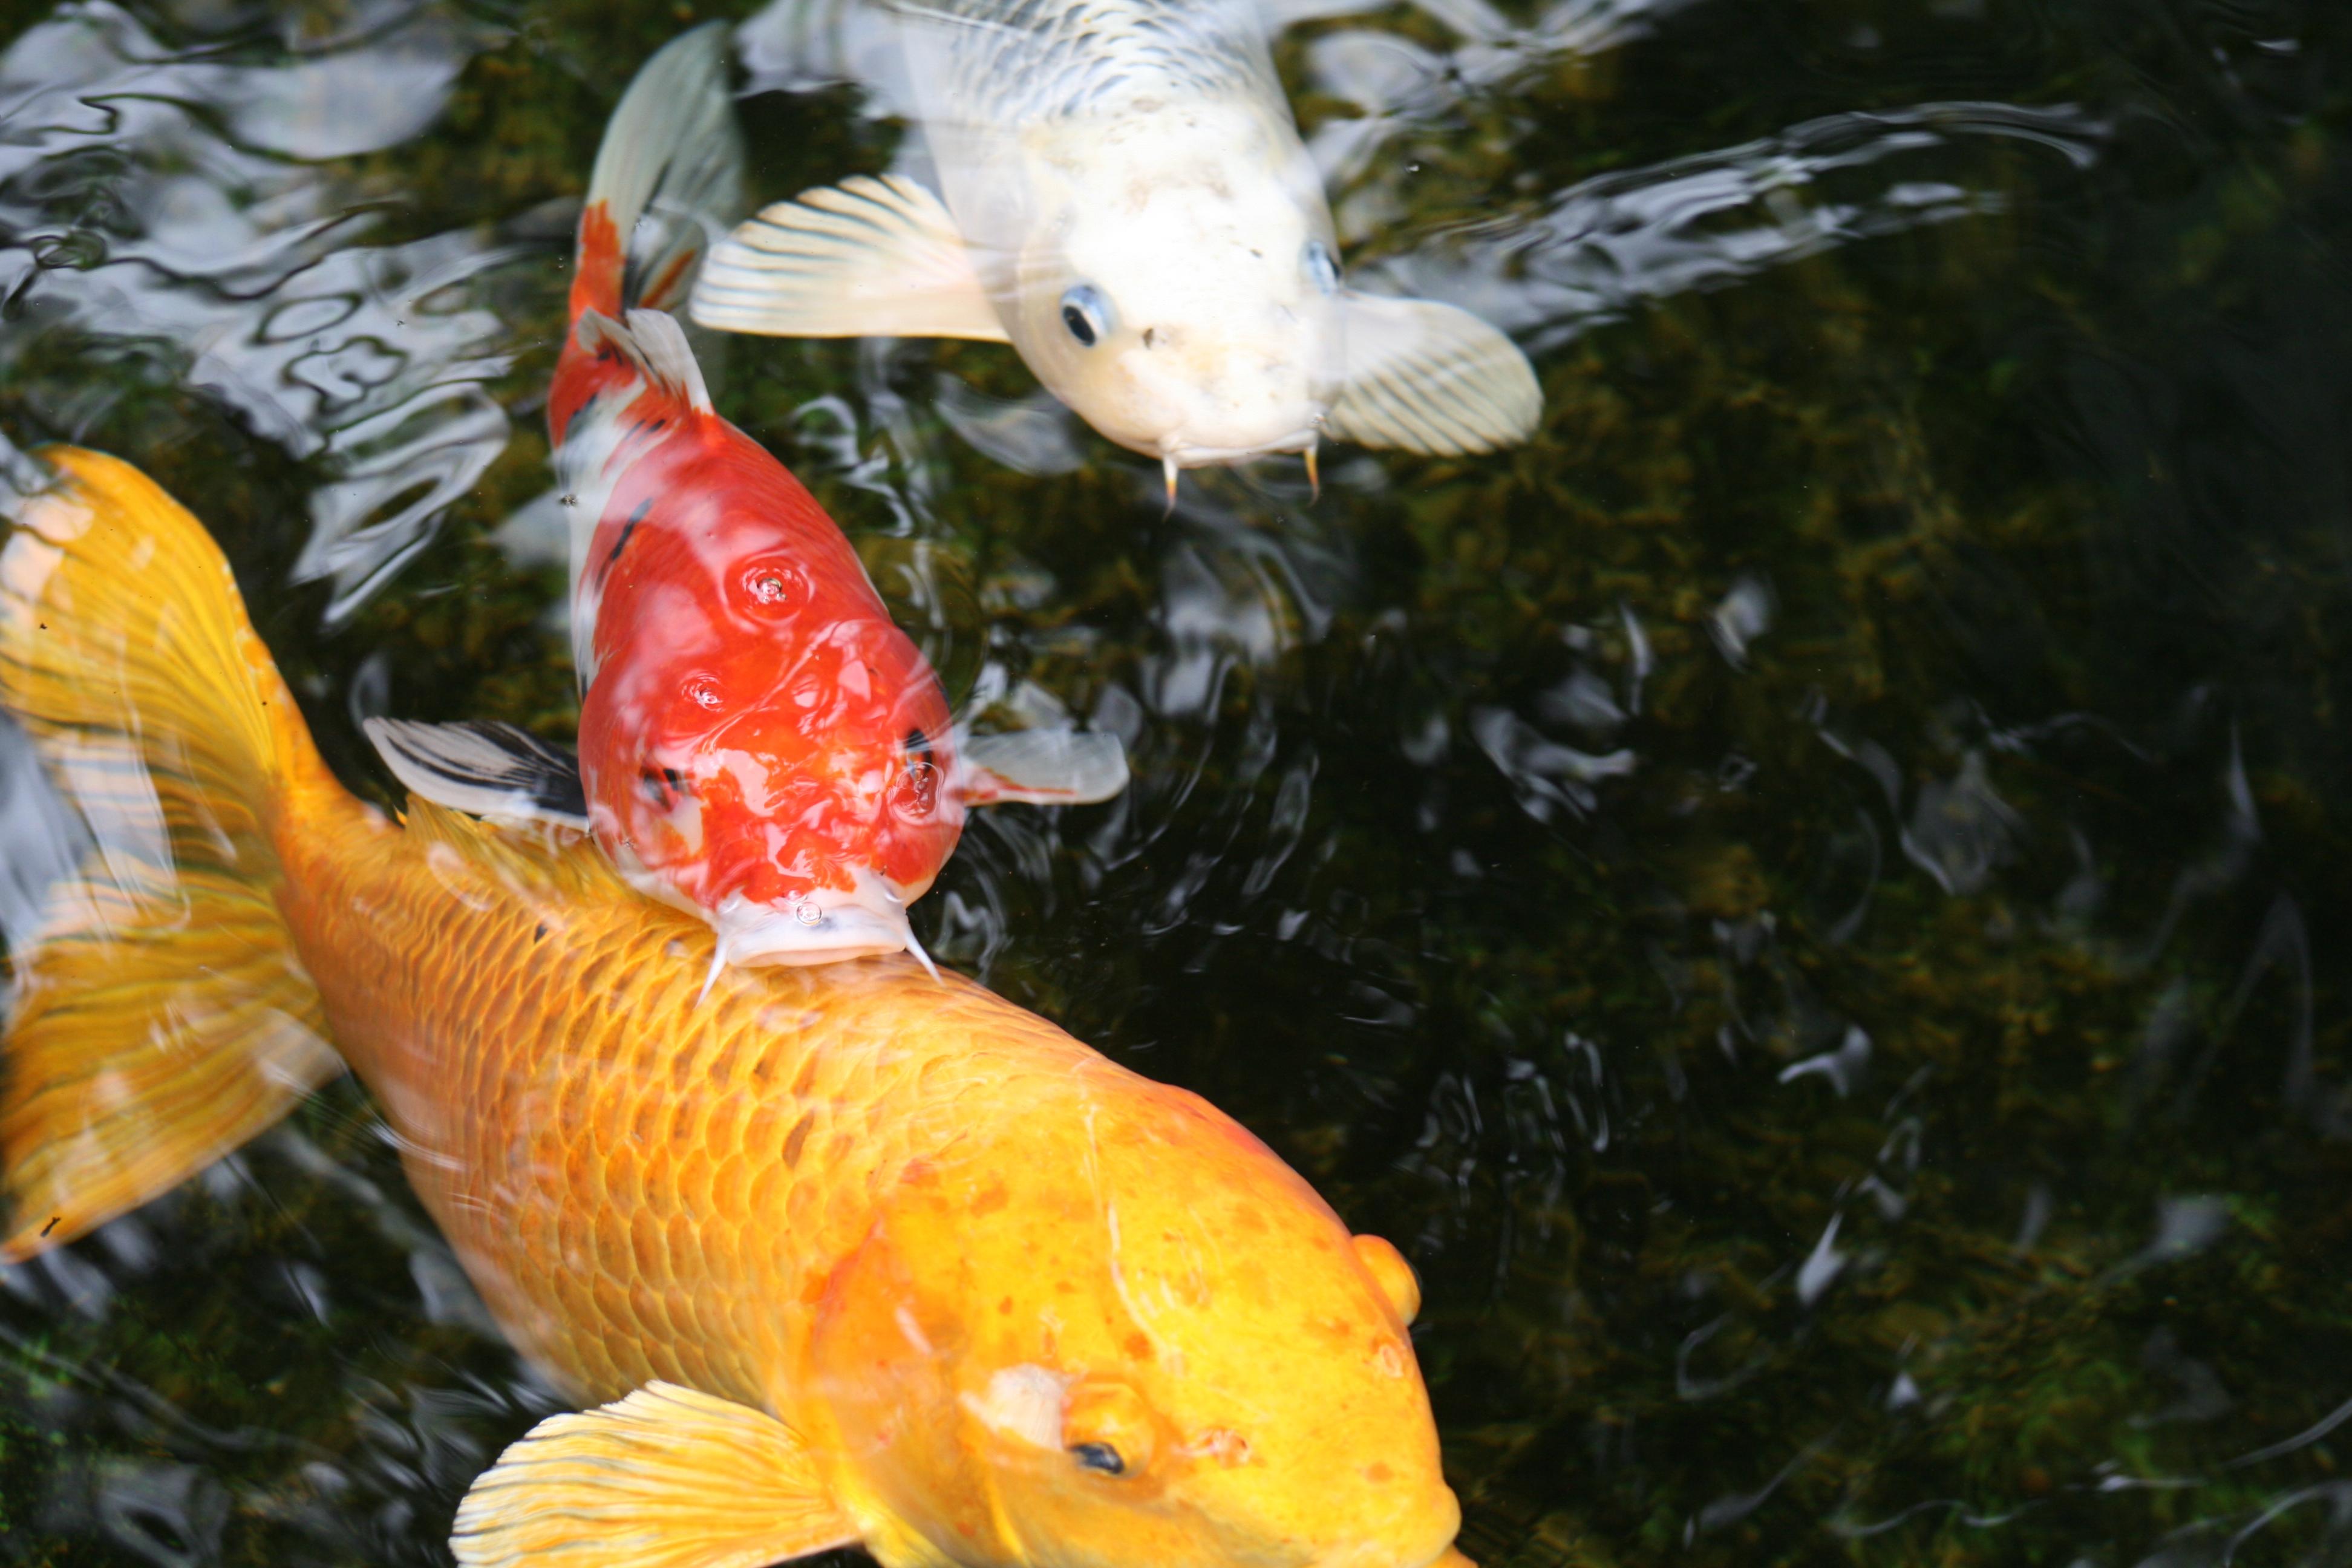 Koi fish at the Self-Realization Fellowship in Encinitas.